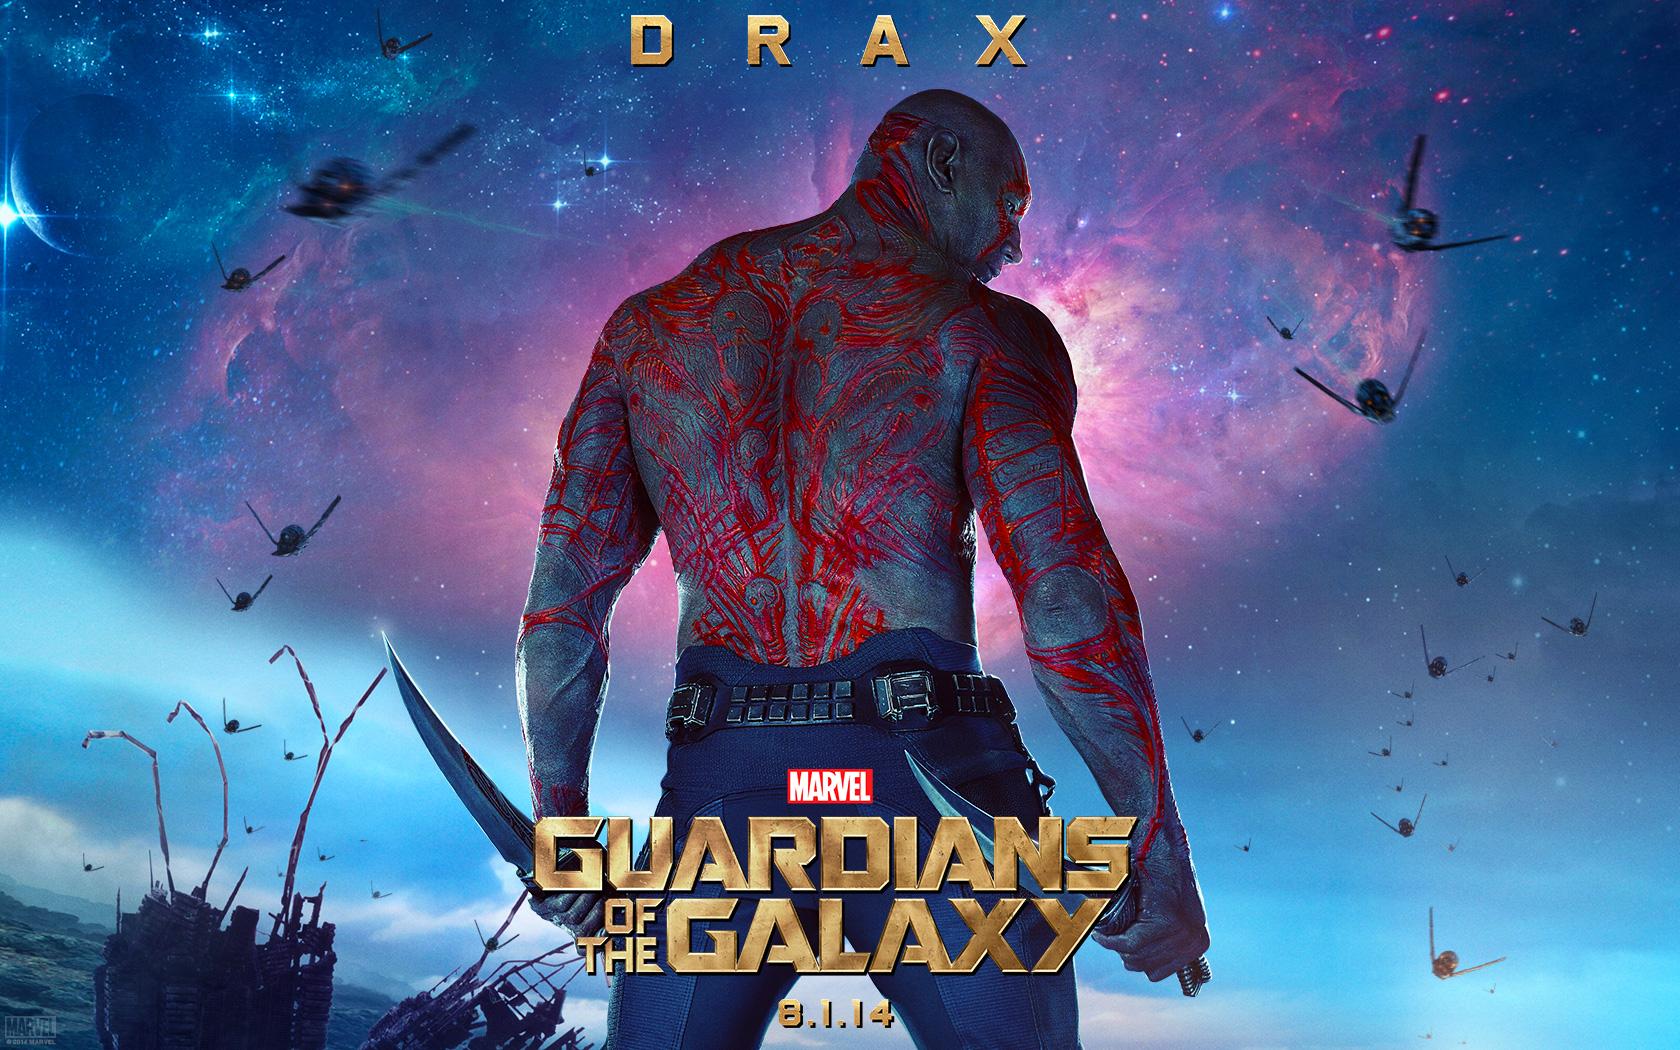 Batista Hd Wallpapers 2014 Wallpapers Guardianes De La Galaxia Fondos Marvel